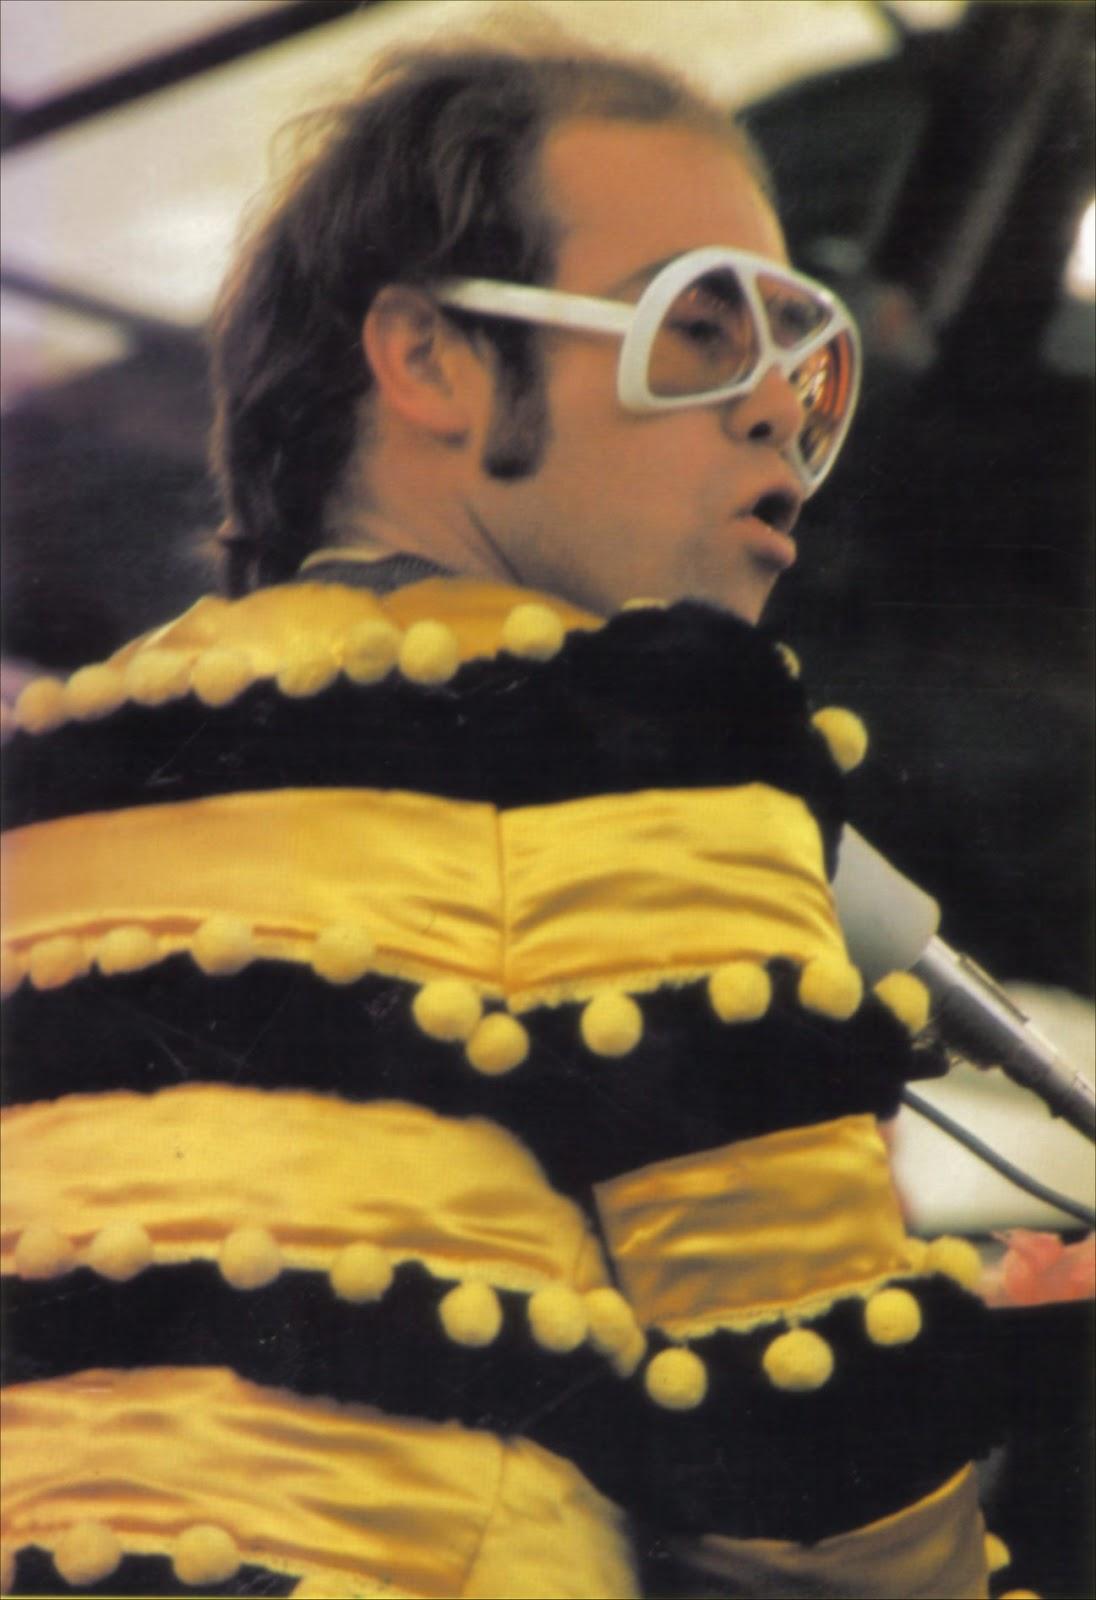 Rock On Vinyl Elton John Unauthorised Rocket Man Vol 2